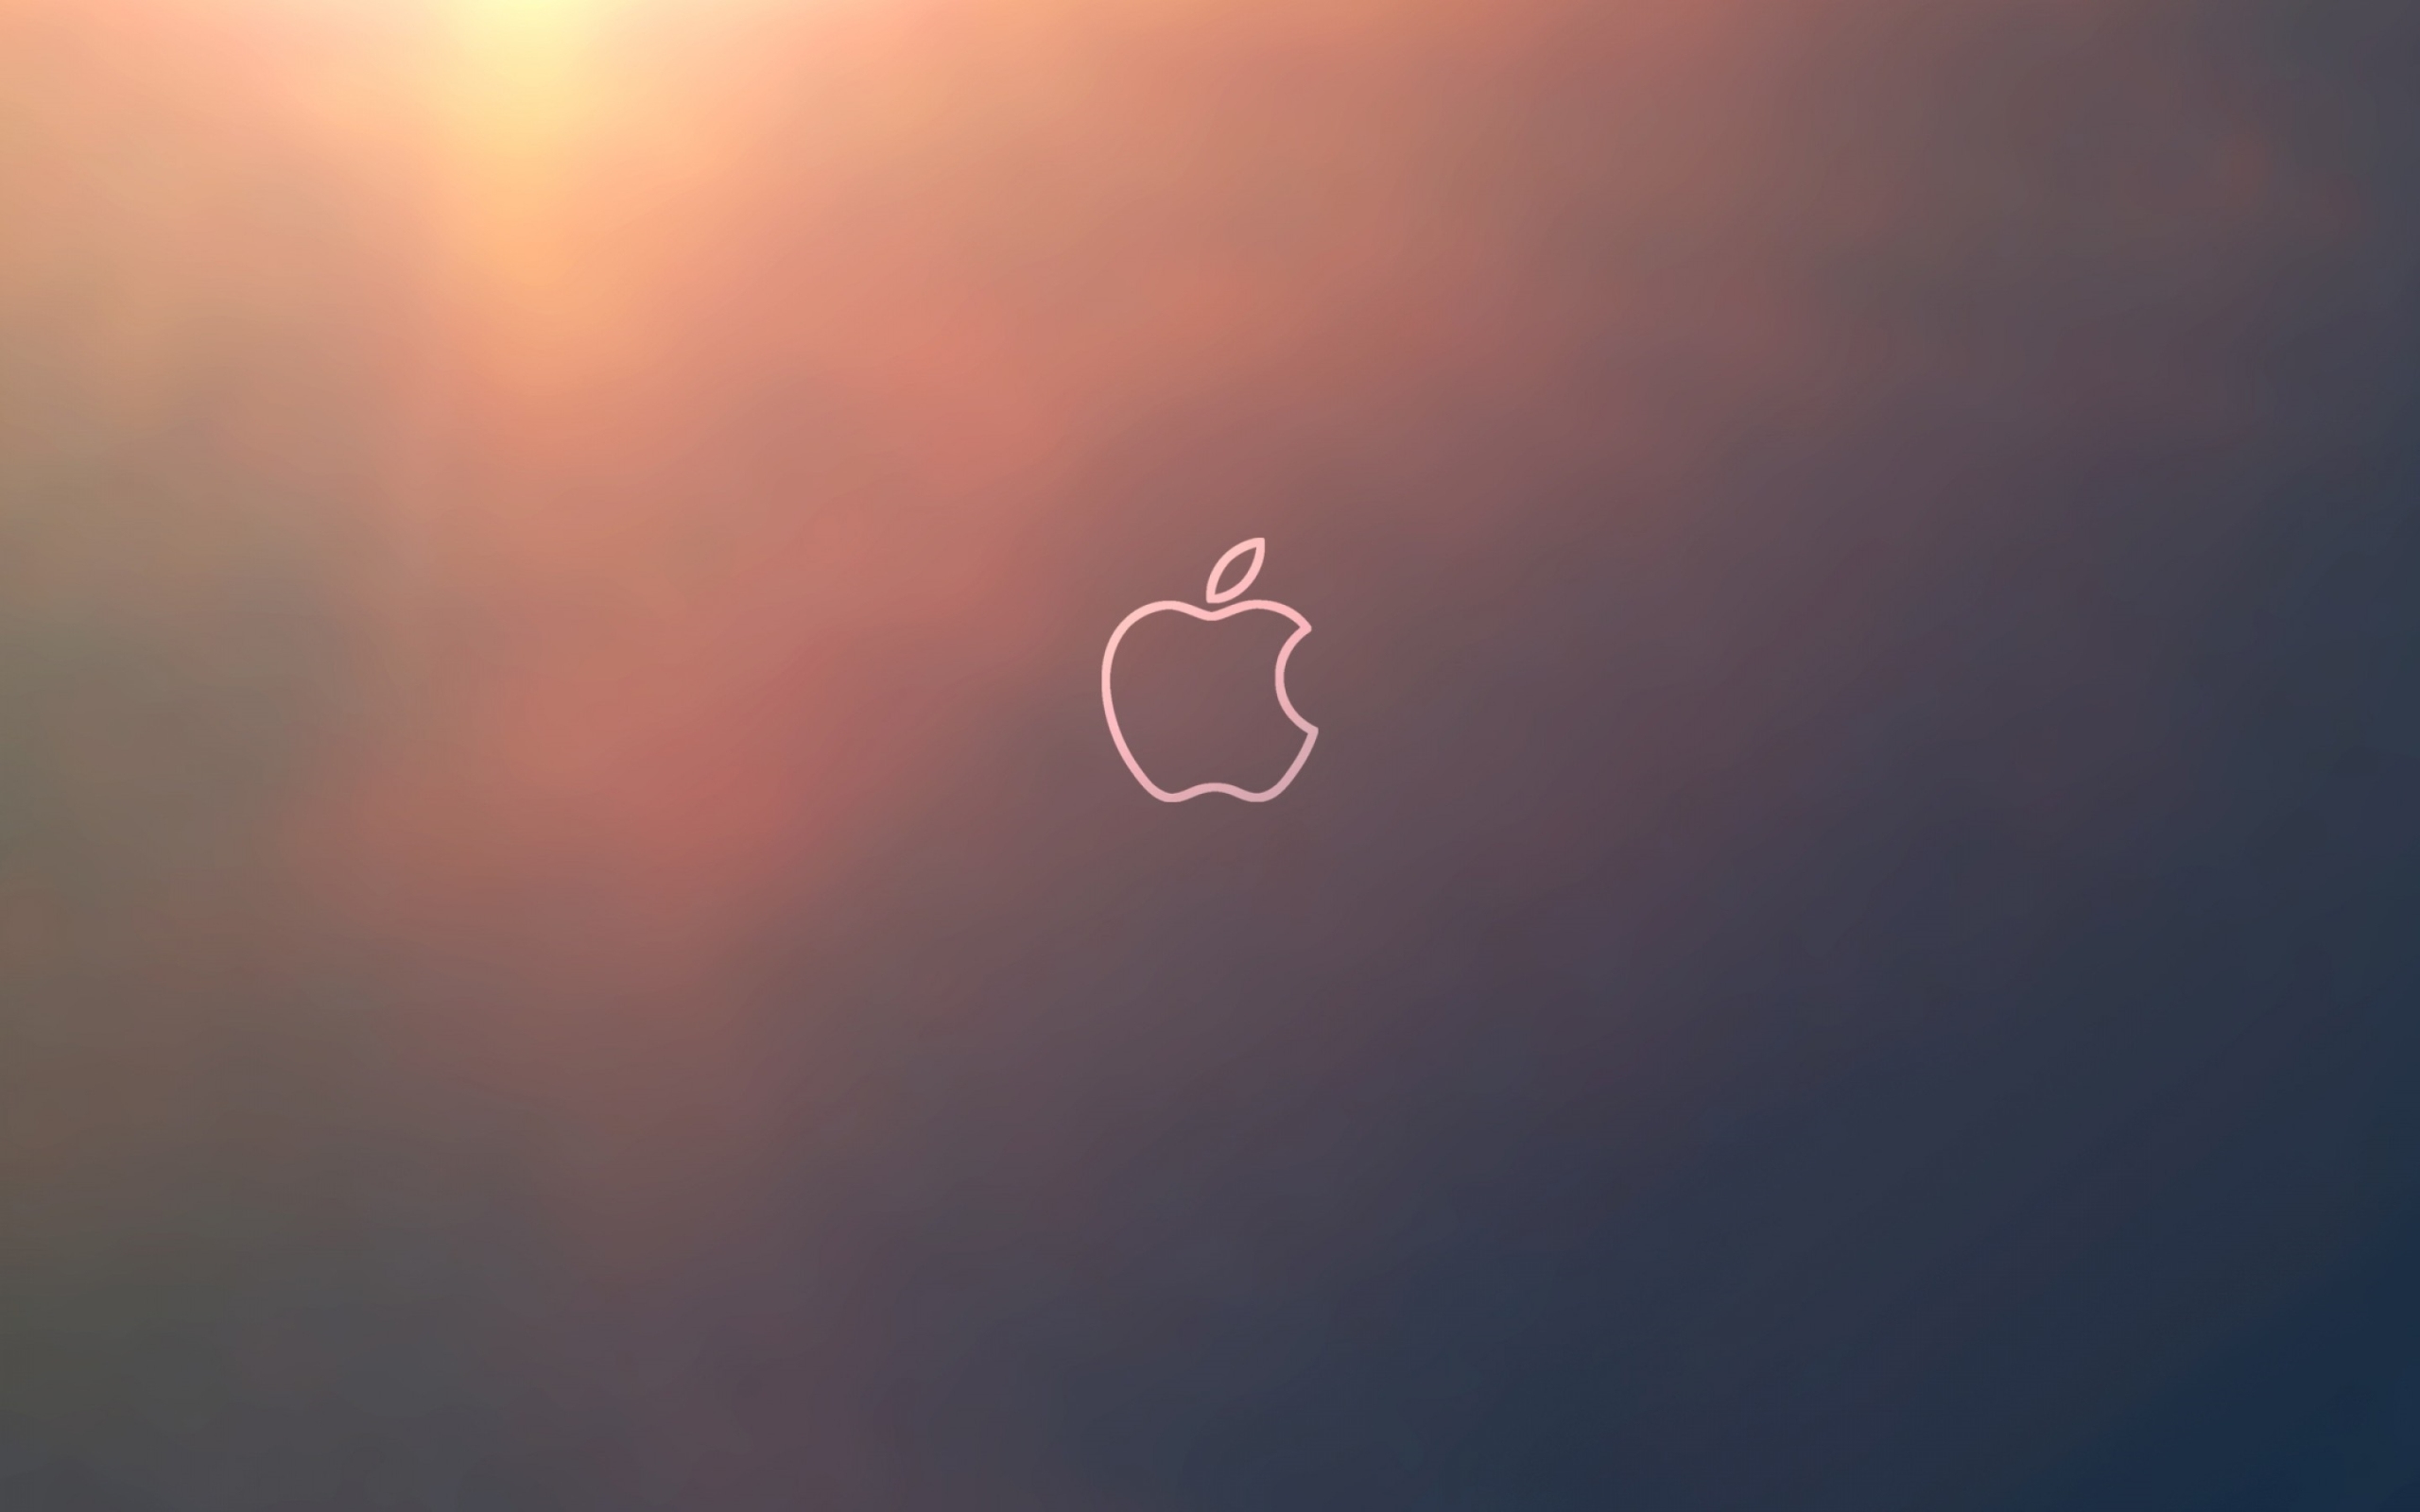 Retina MacBook Pro 15 inch 2880x1800 Retina MacBook Pro 13 inch 2560x1600